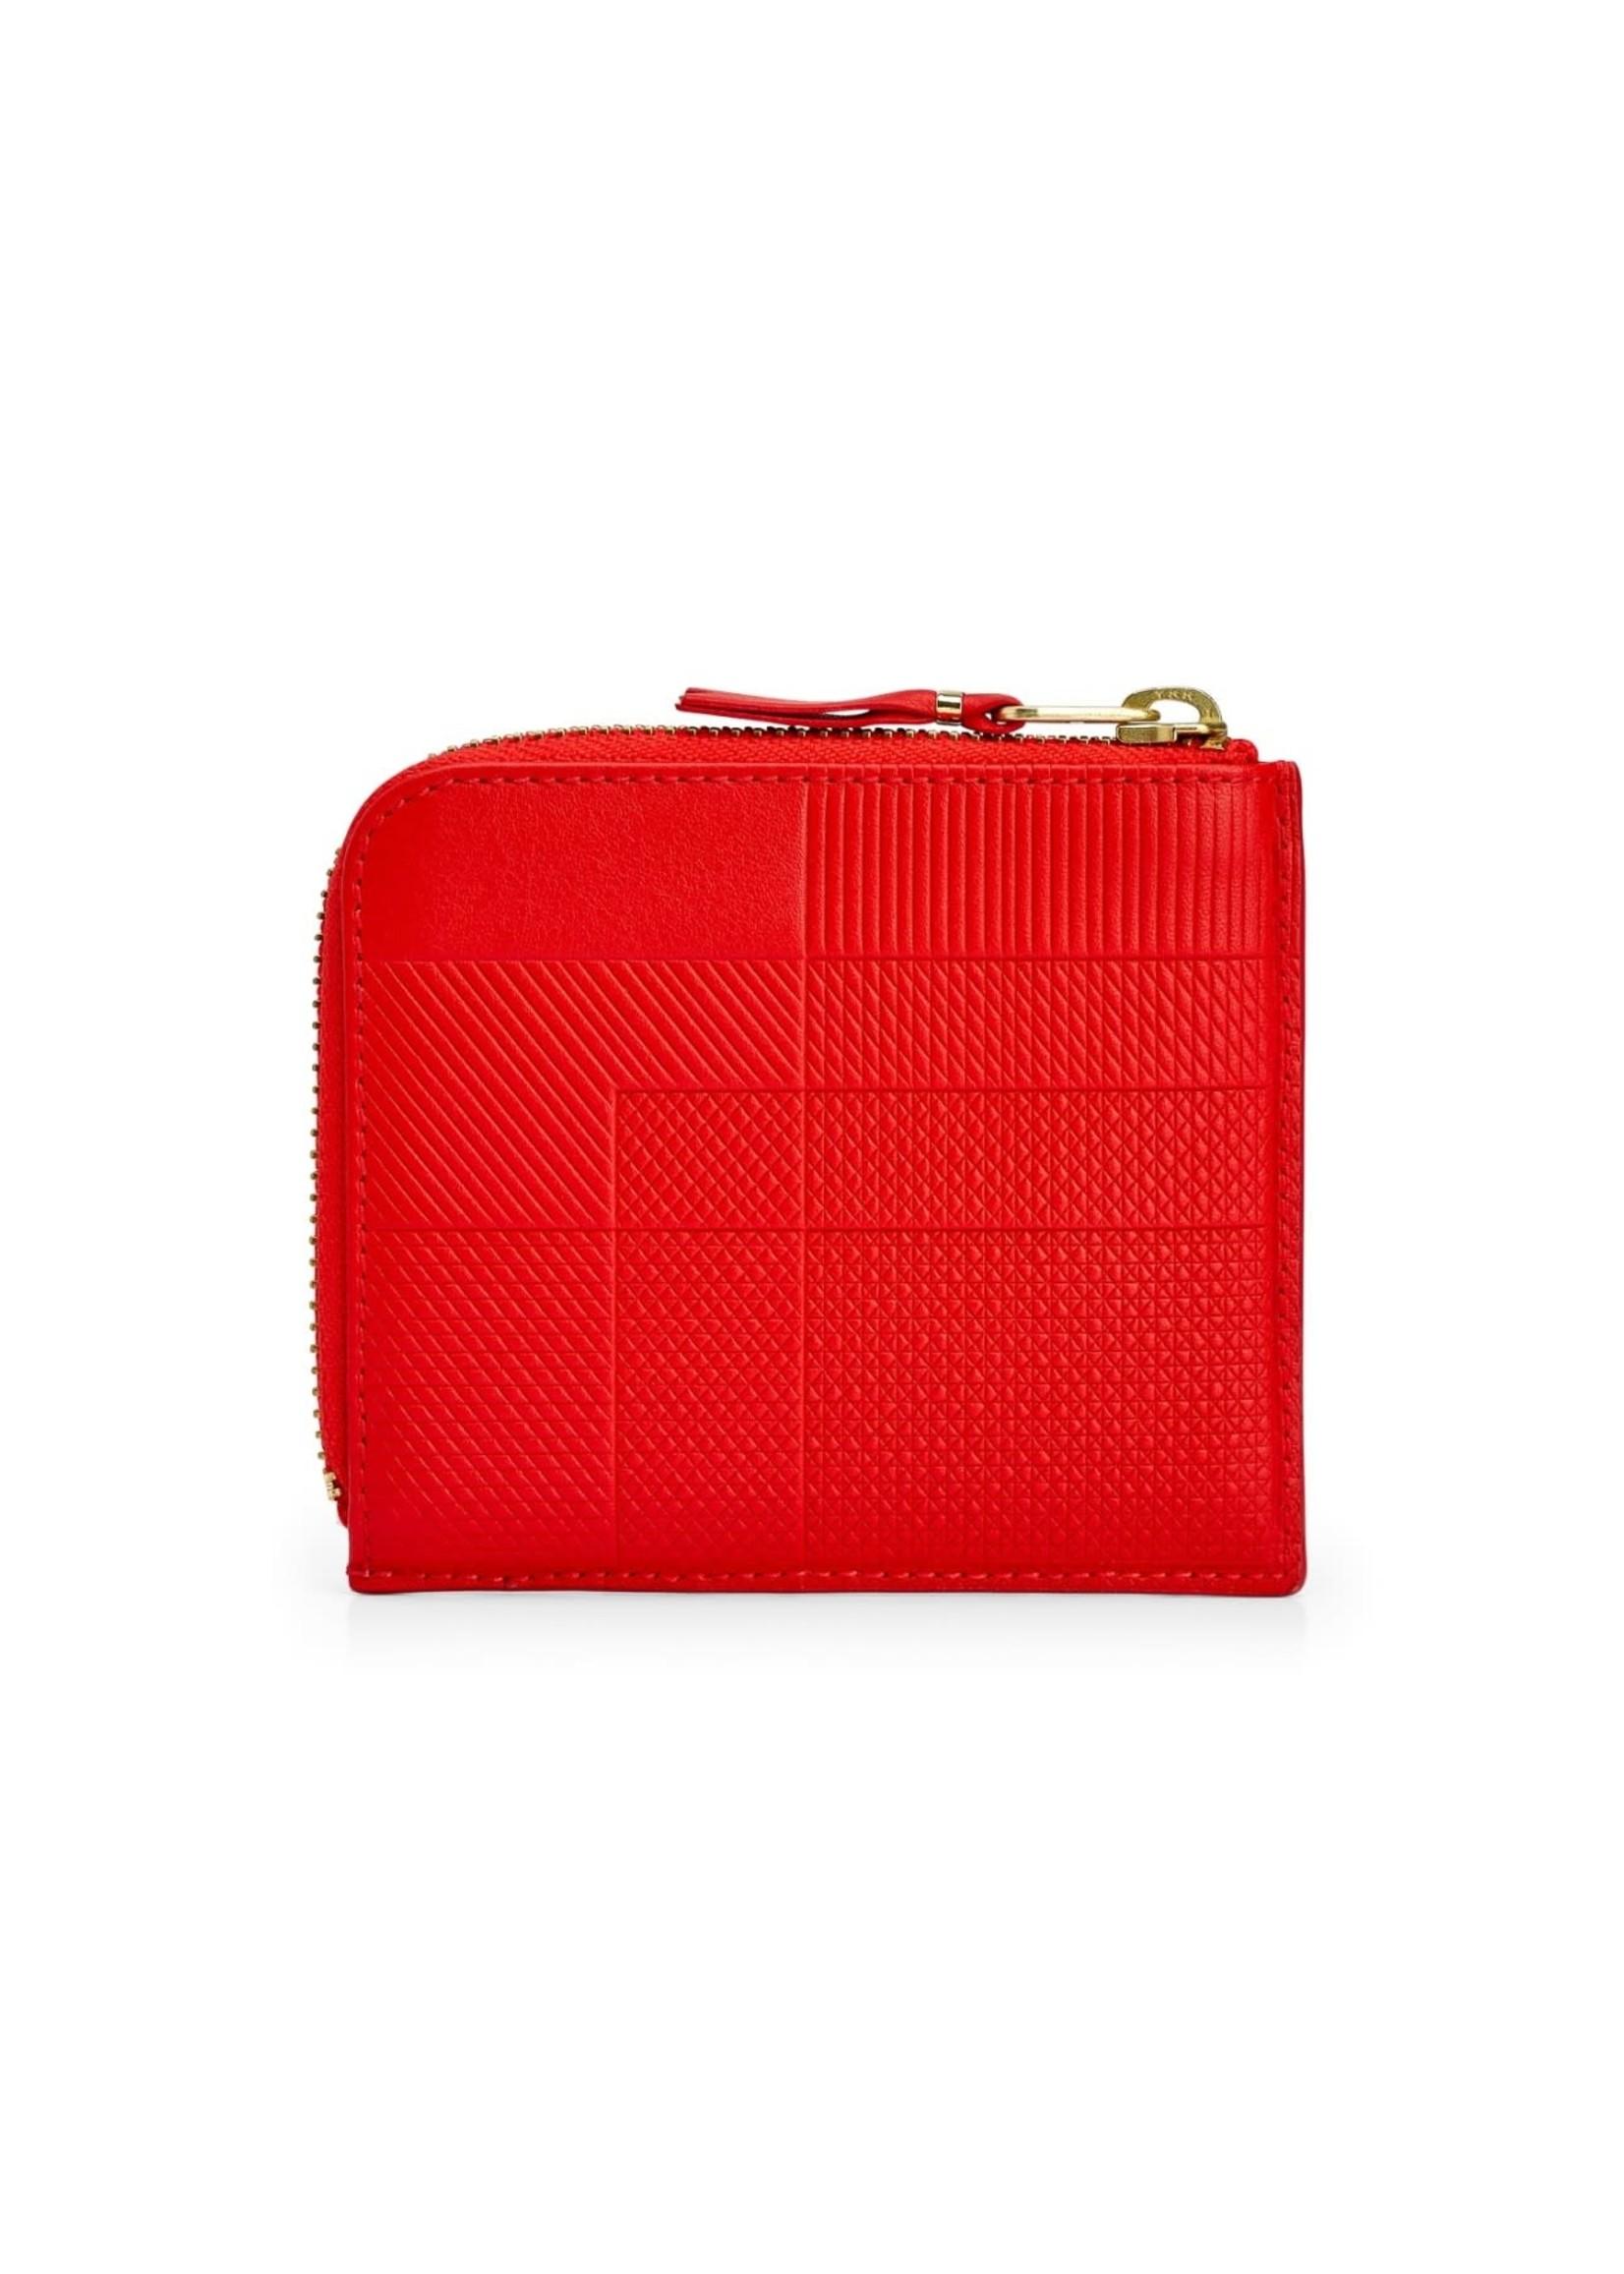 COMME des GARÇONS WALLET ntersection Lines 1/2 Zip Wallet Red SA3100LS